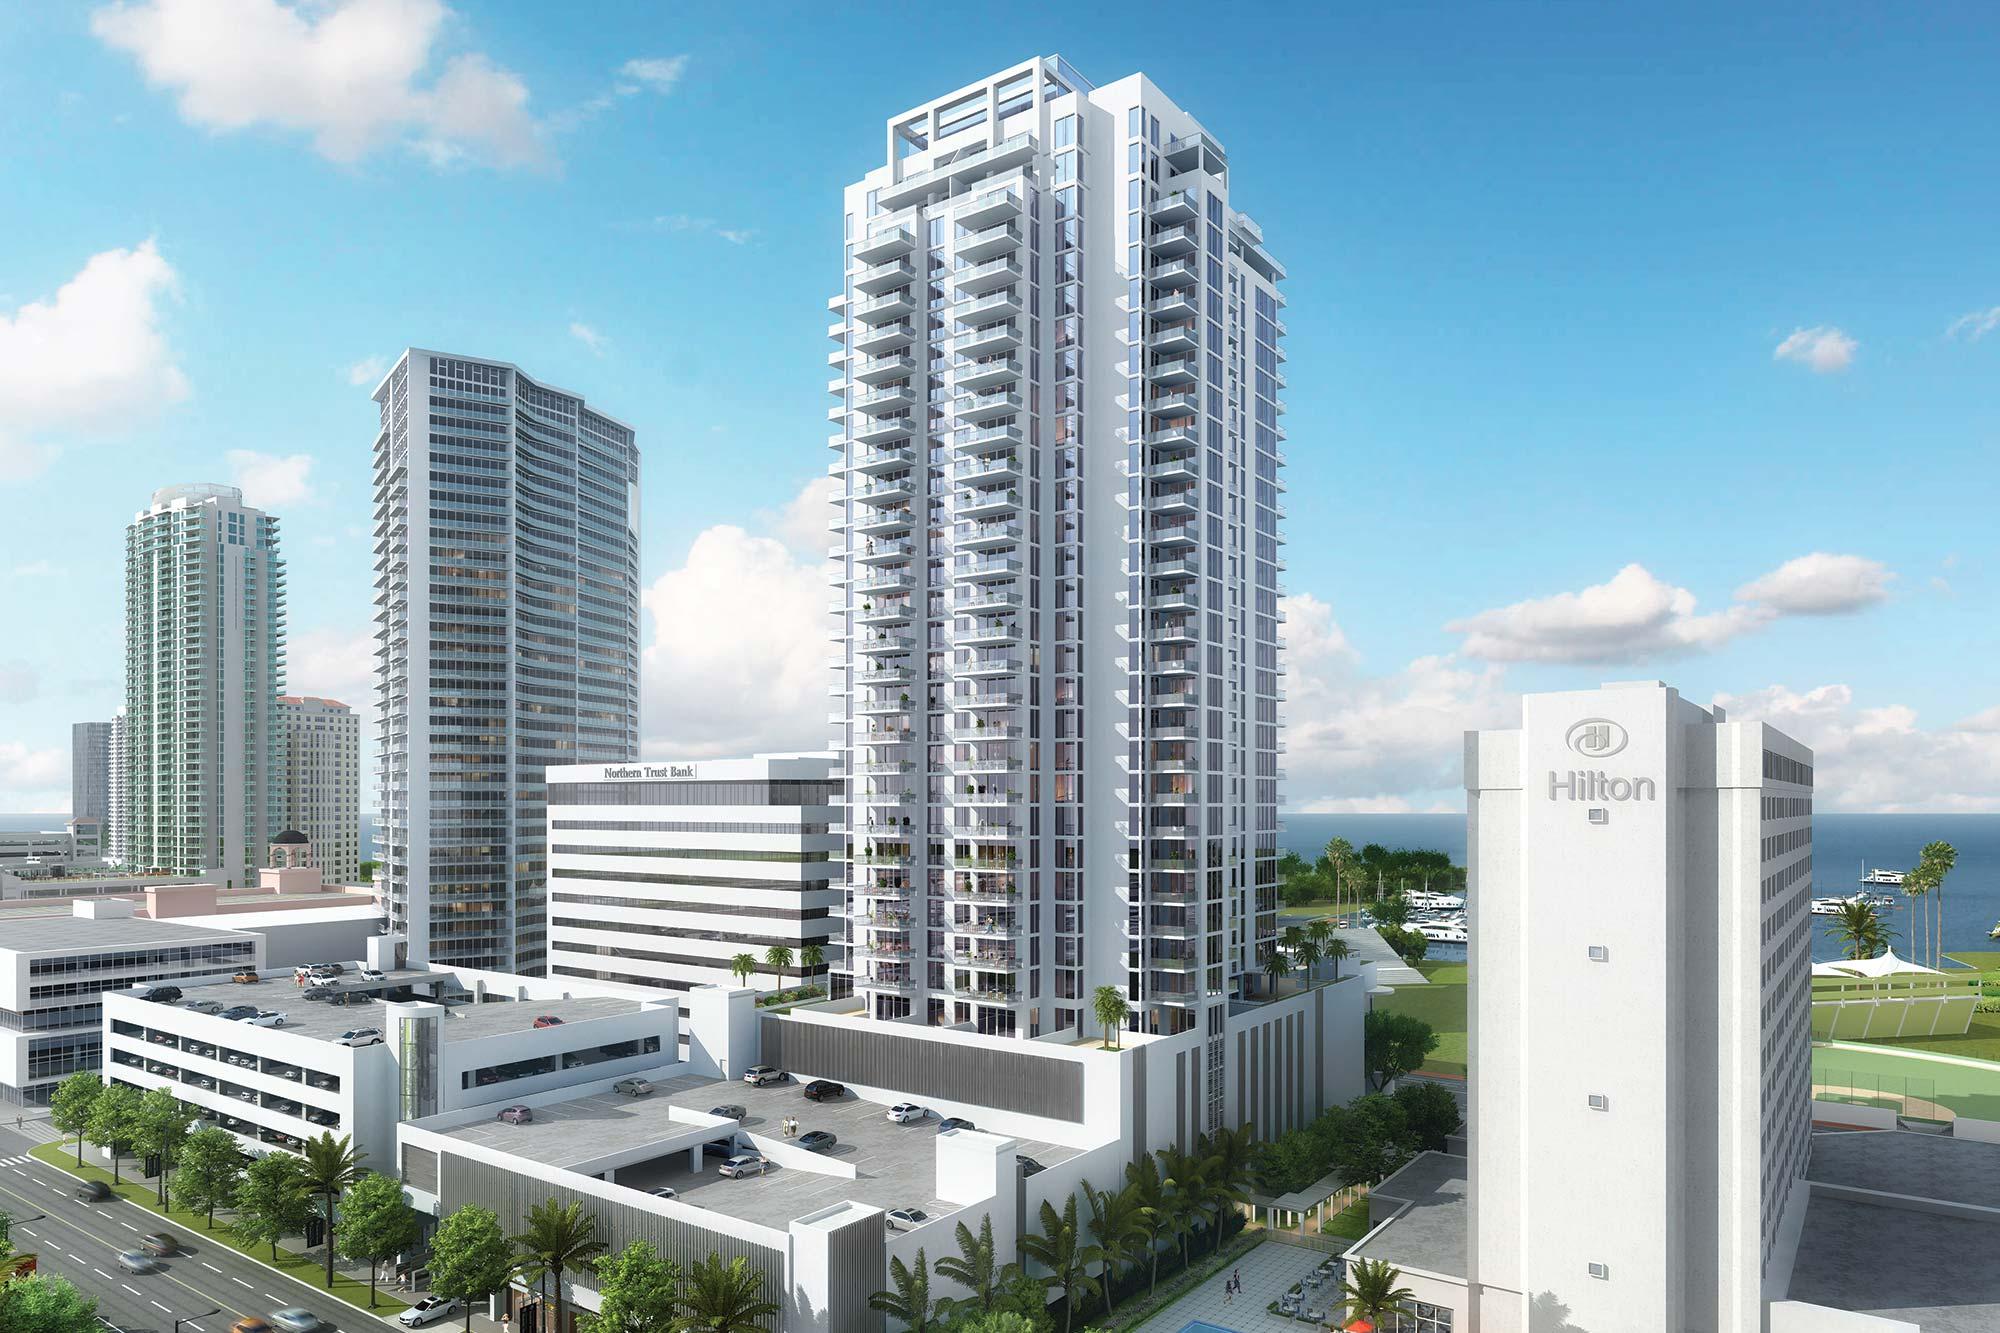 Luxury Waterfront Condos St Petersburg FL